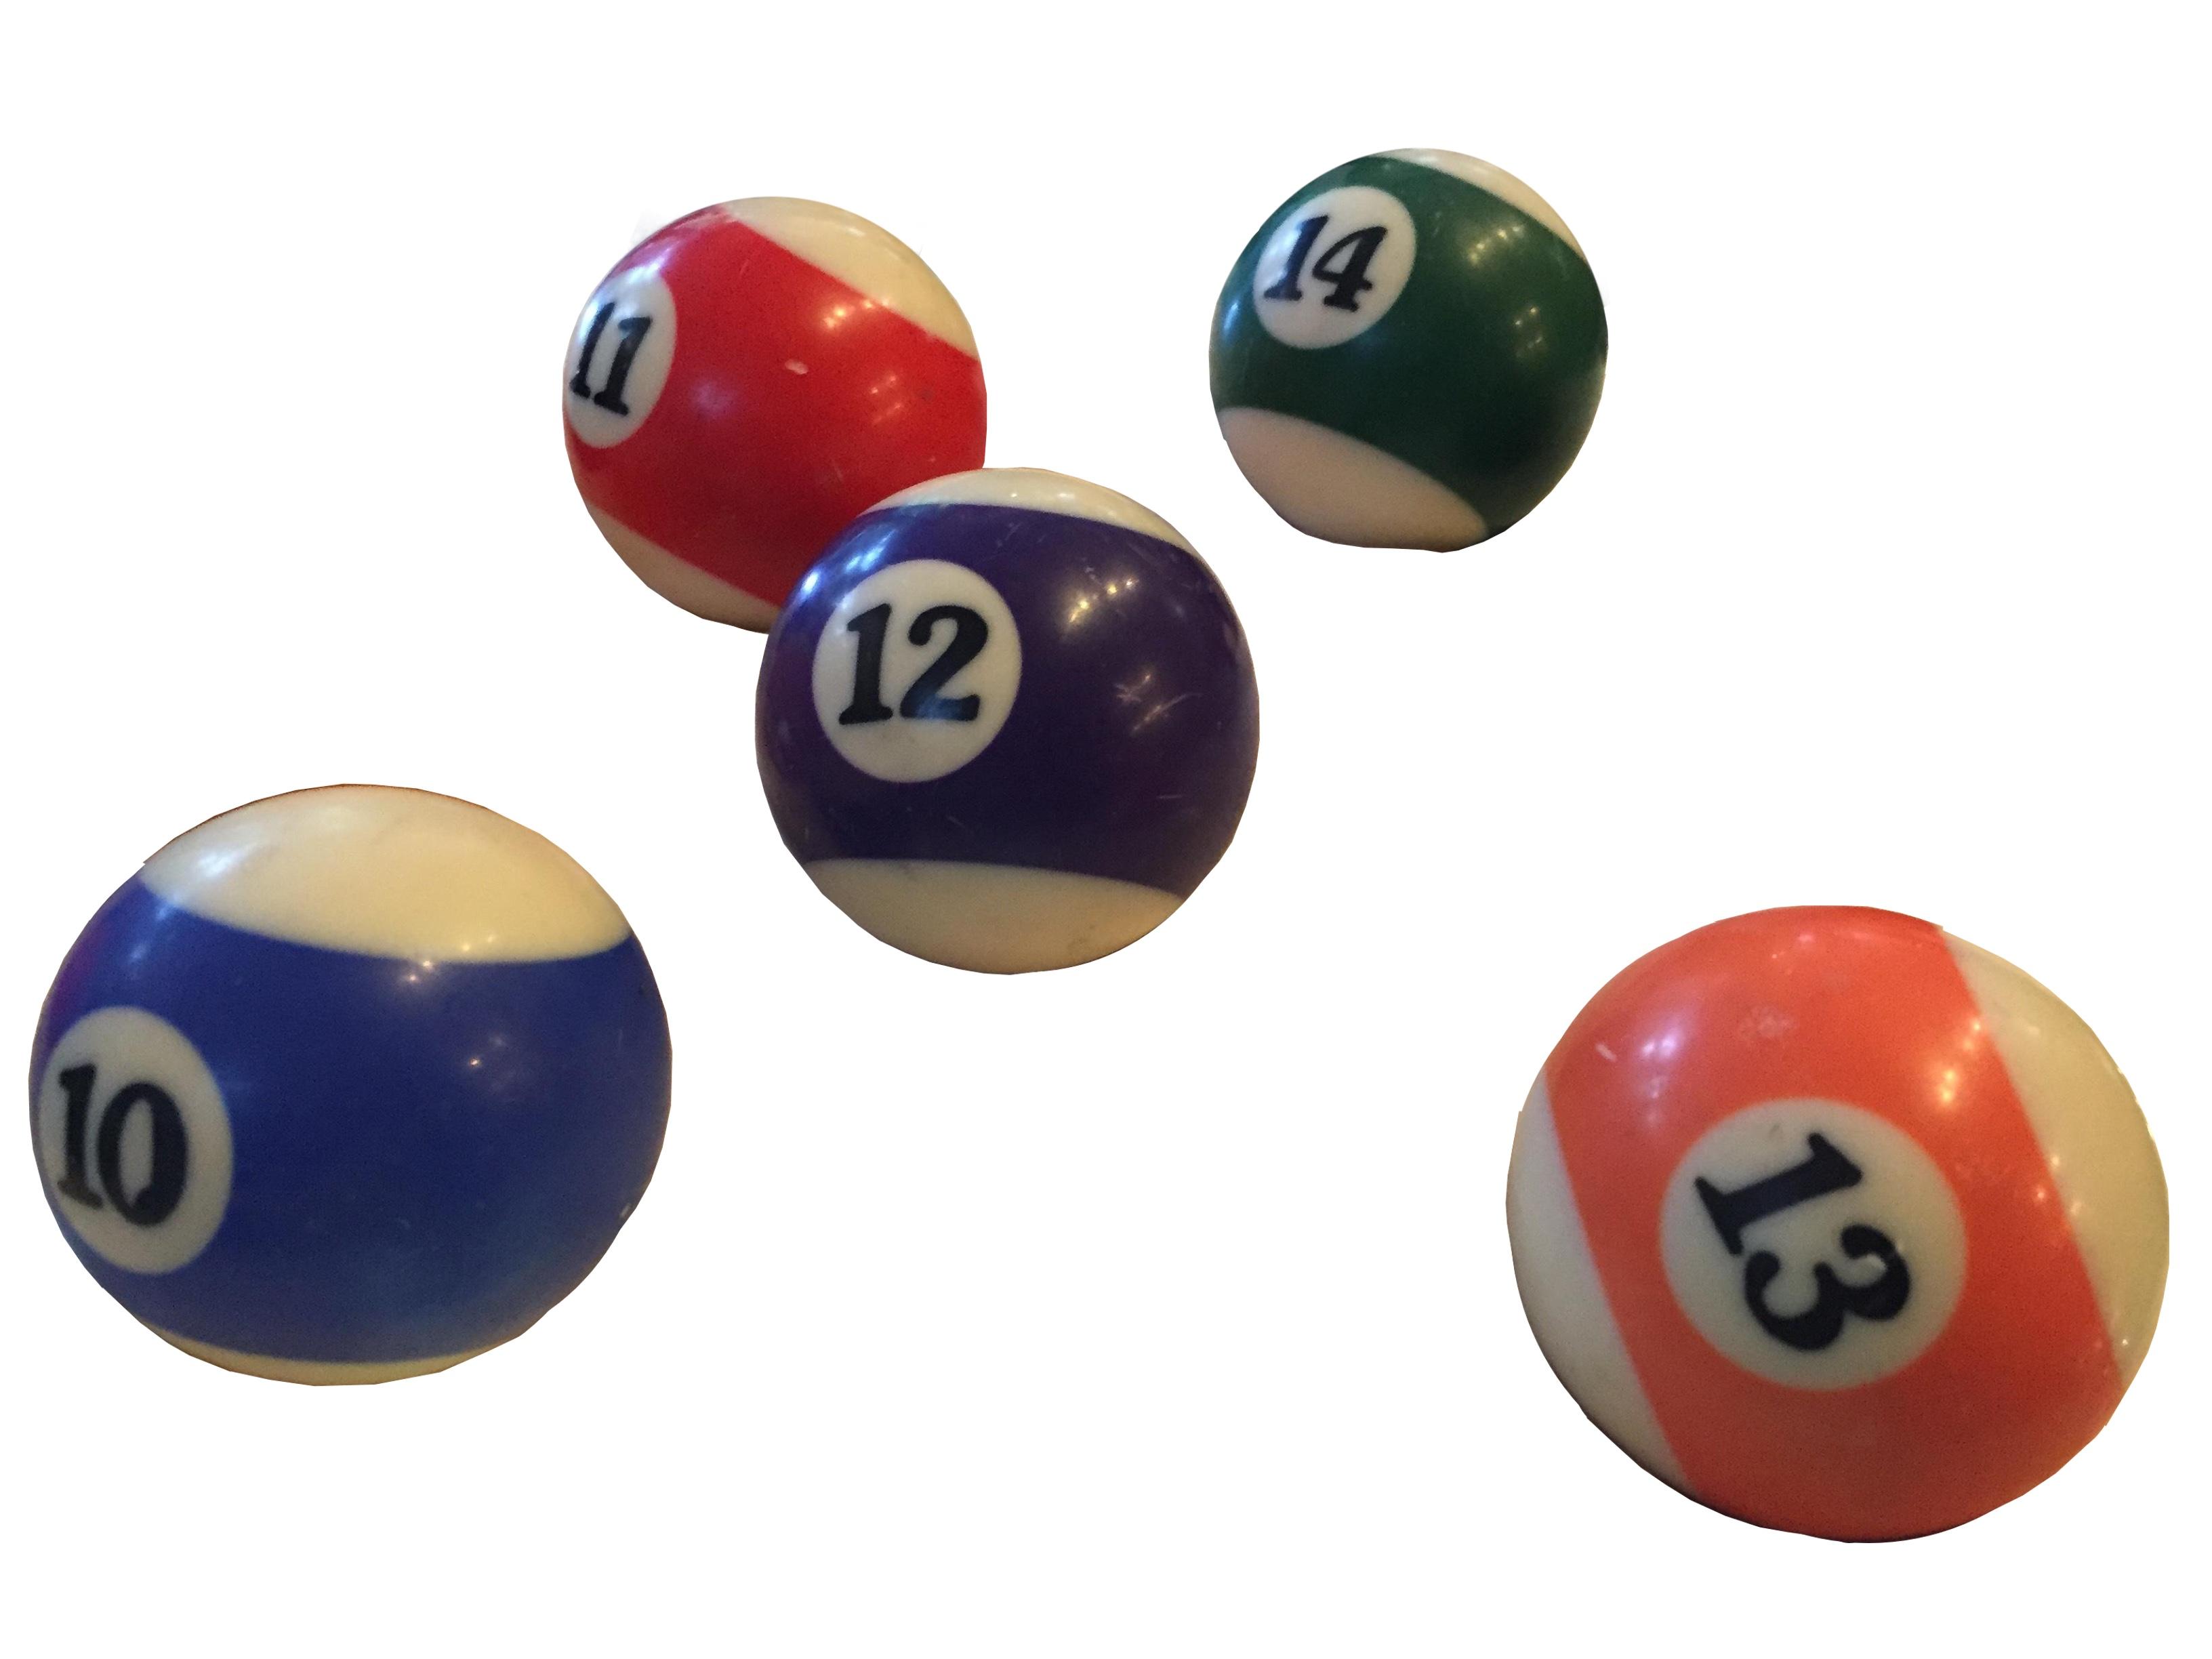 Bakelite Snooker Balls Set Of 16 Snooker Balls Snooker Billiard Balls